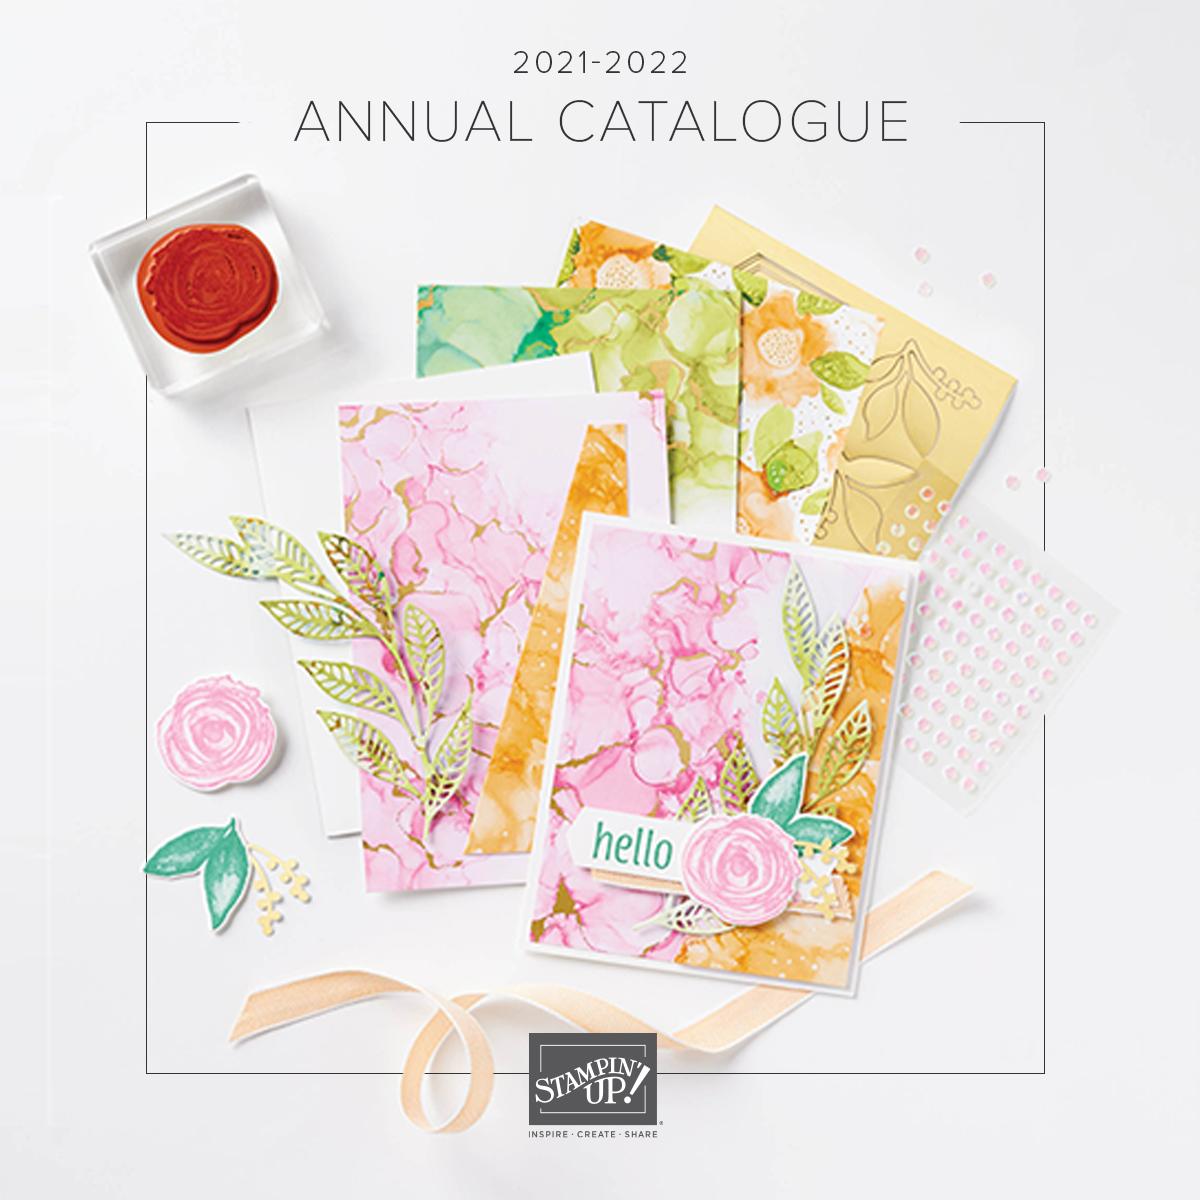 2021-2022 AC COVER